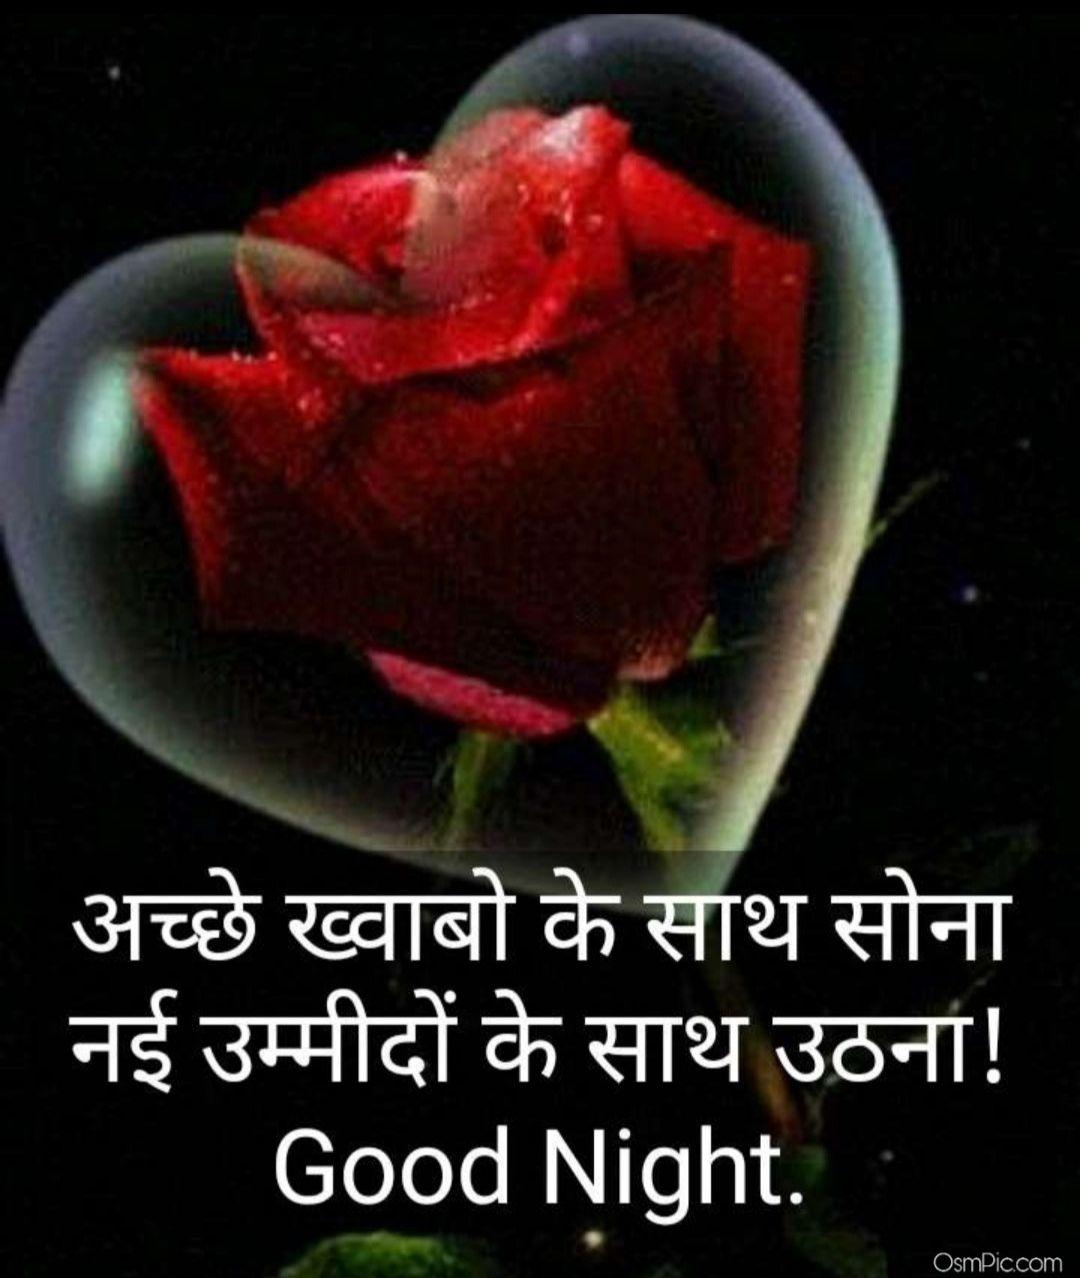 Good Night Sweet Dreams Images In Hindi Good Night Hindi Good Night Quotes Good Night Hindi Quotes